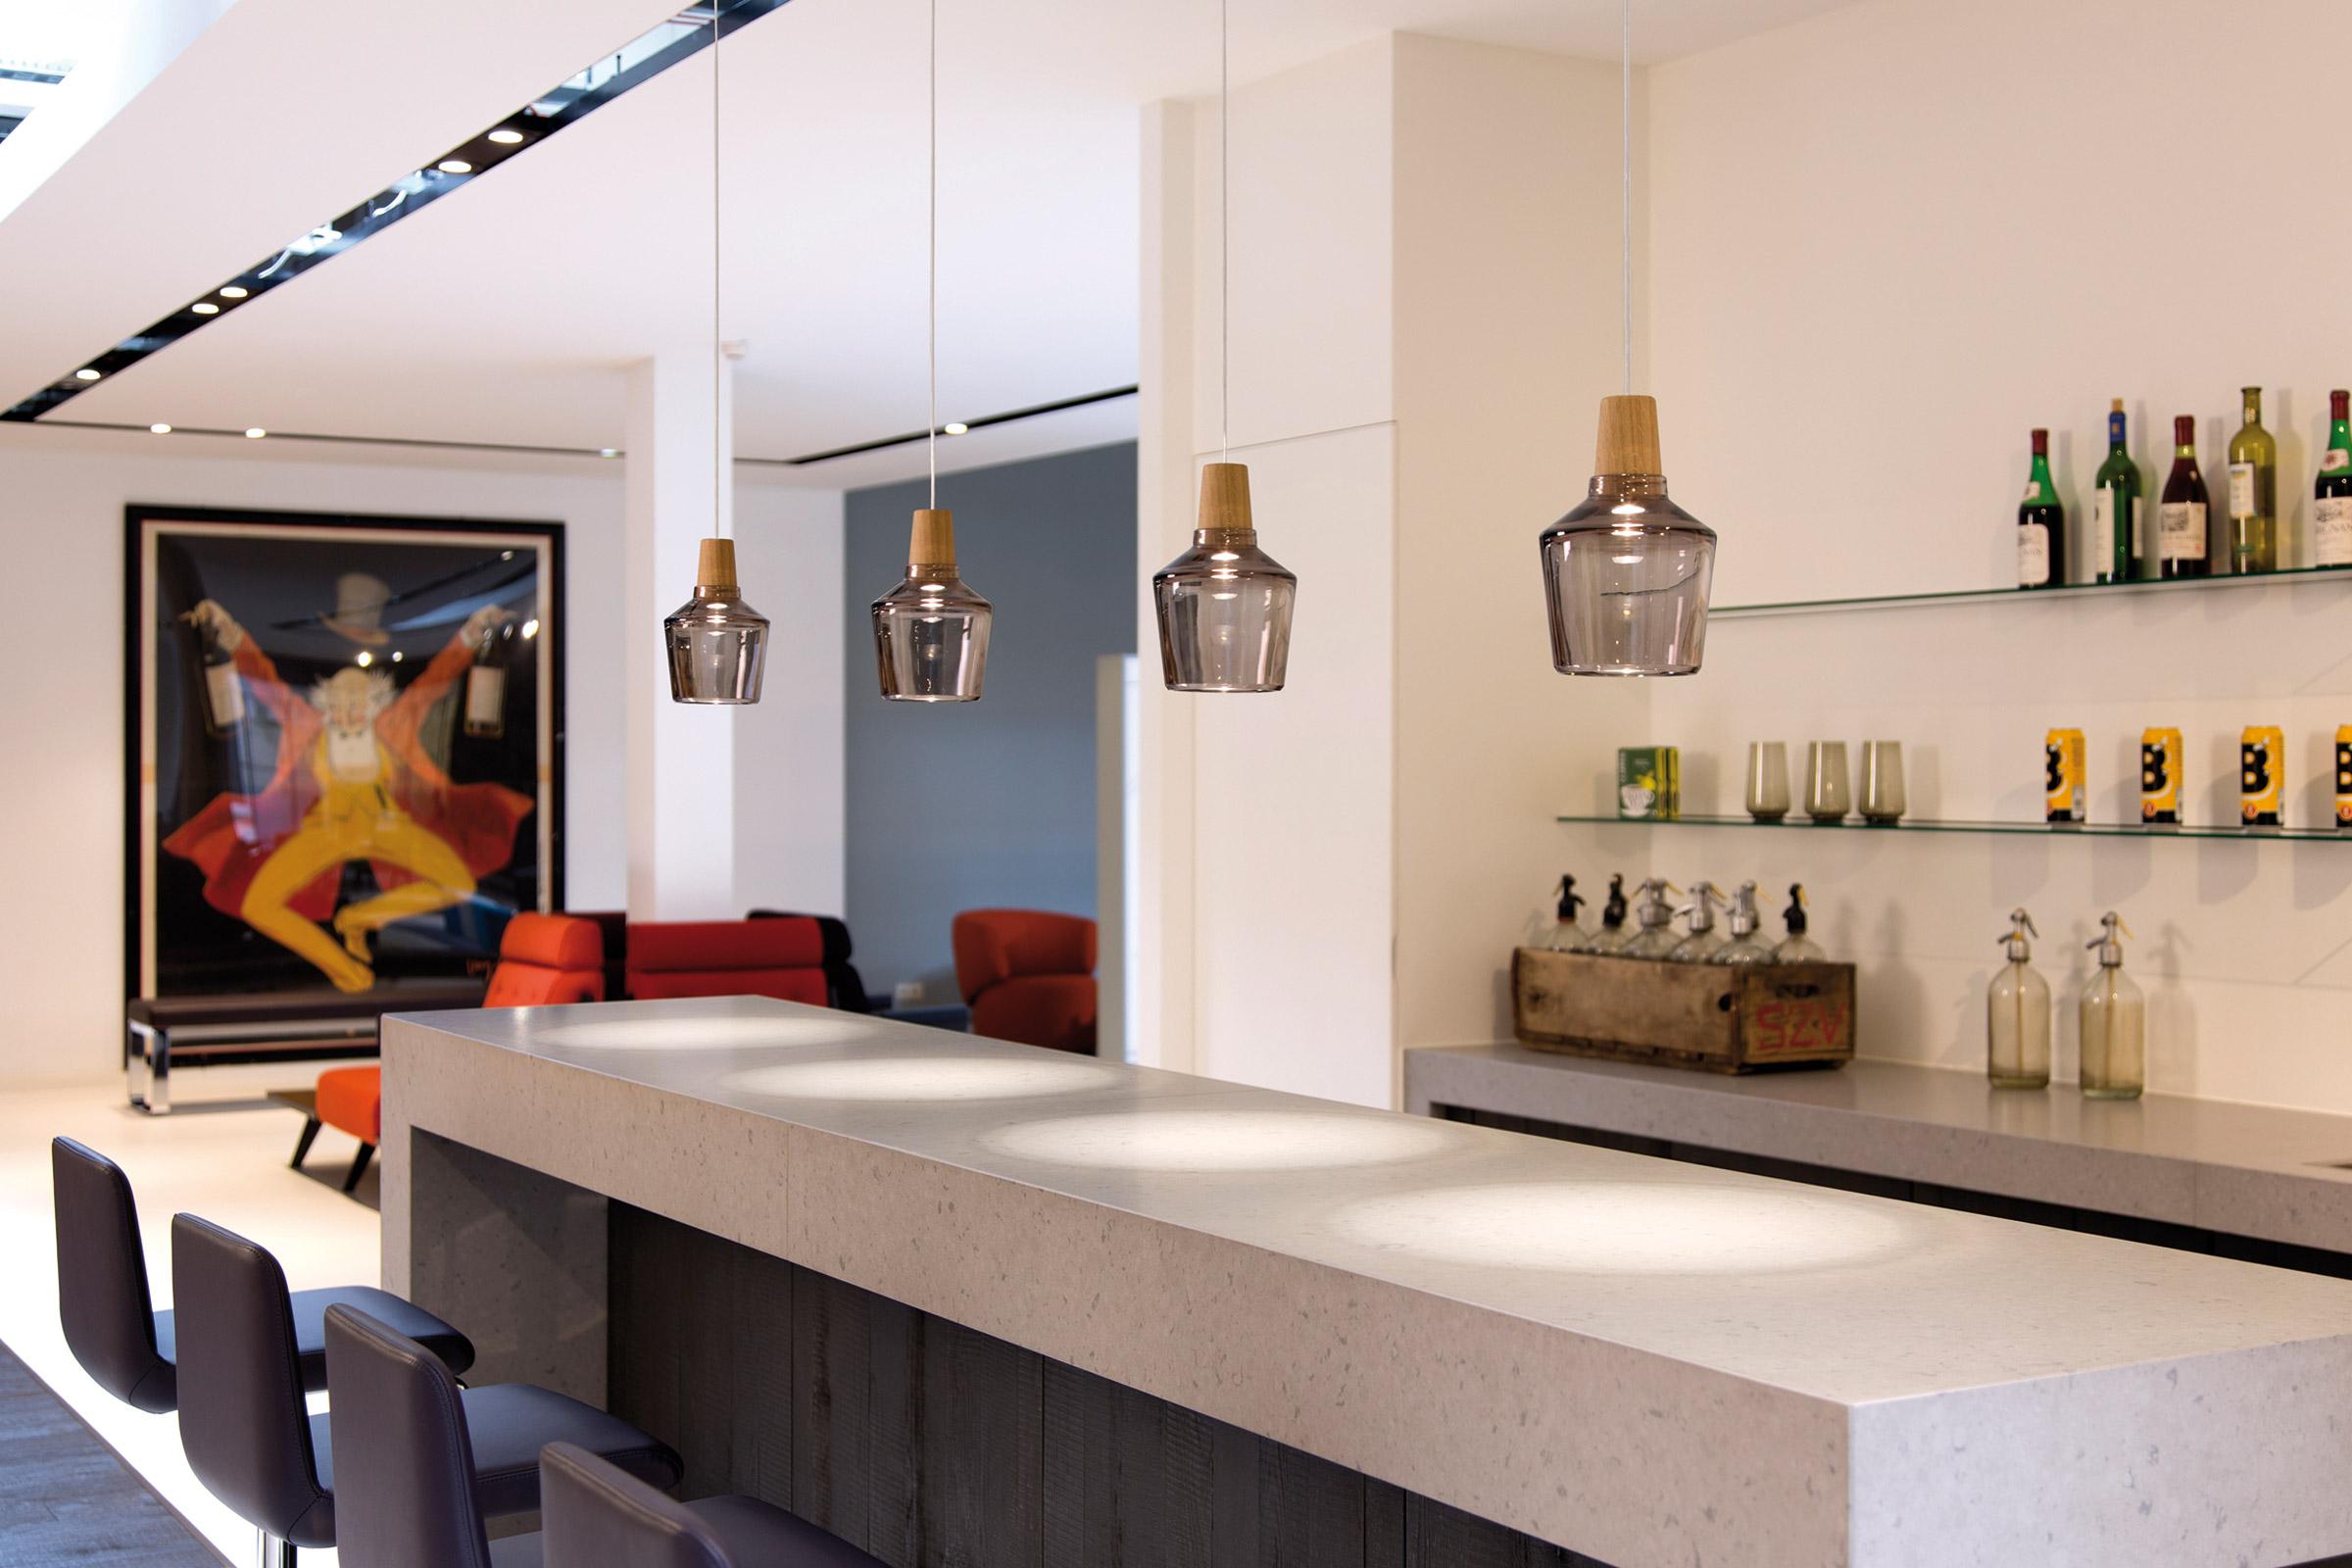 industrial 15 16p von deizehngrad i holzdesignpur. Black Bedroom Furniture Sets. Home Design Ideas